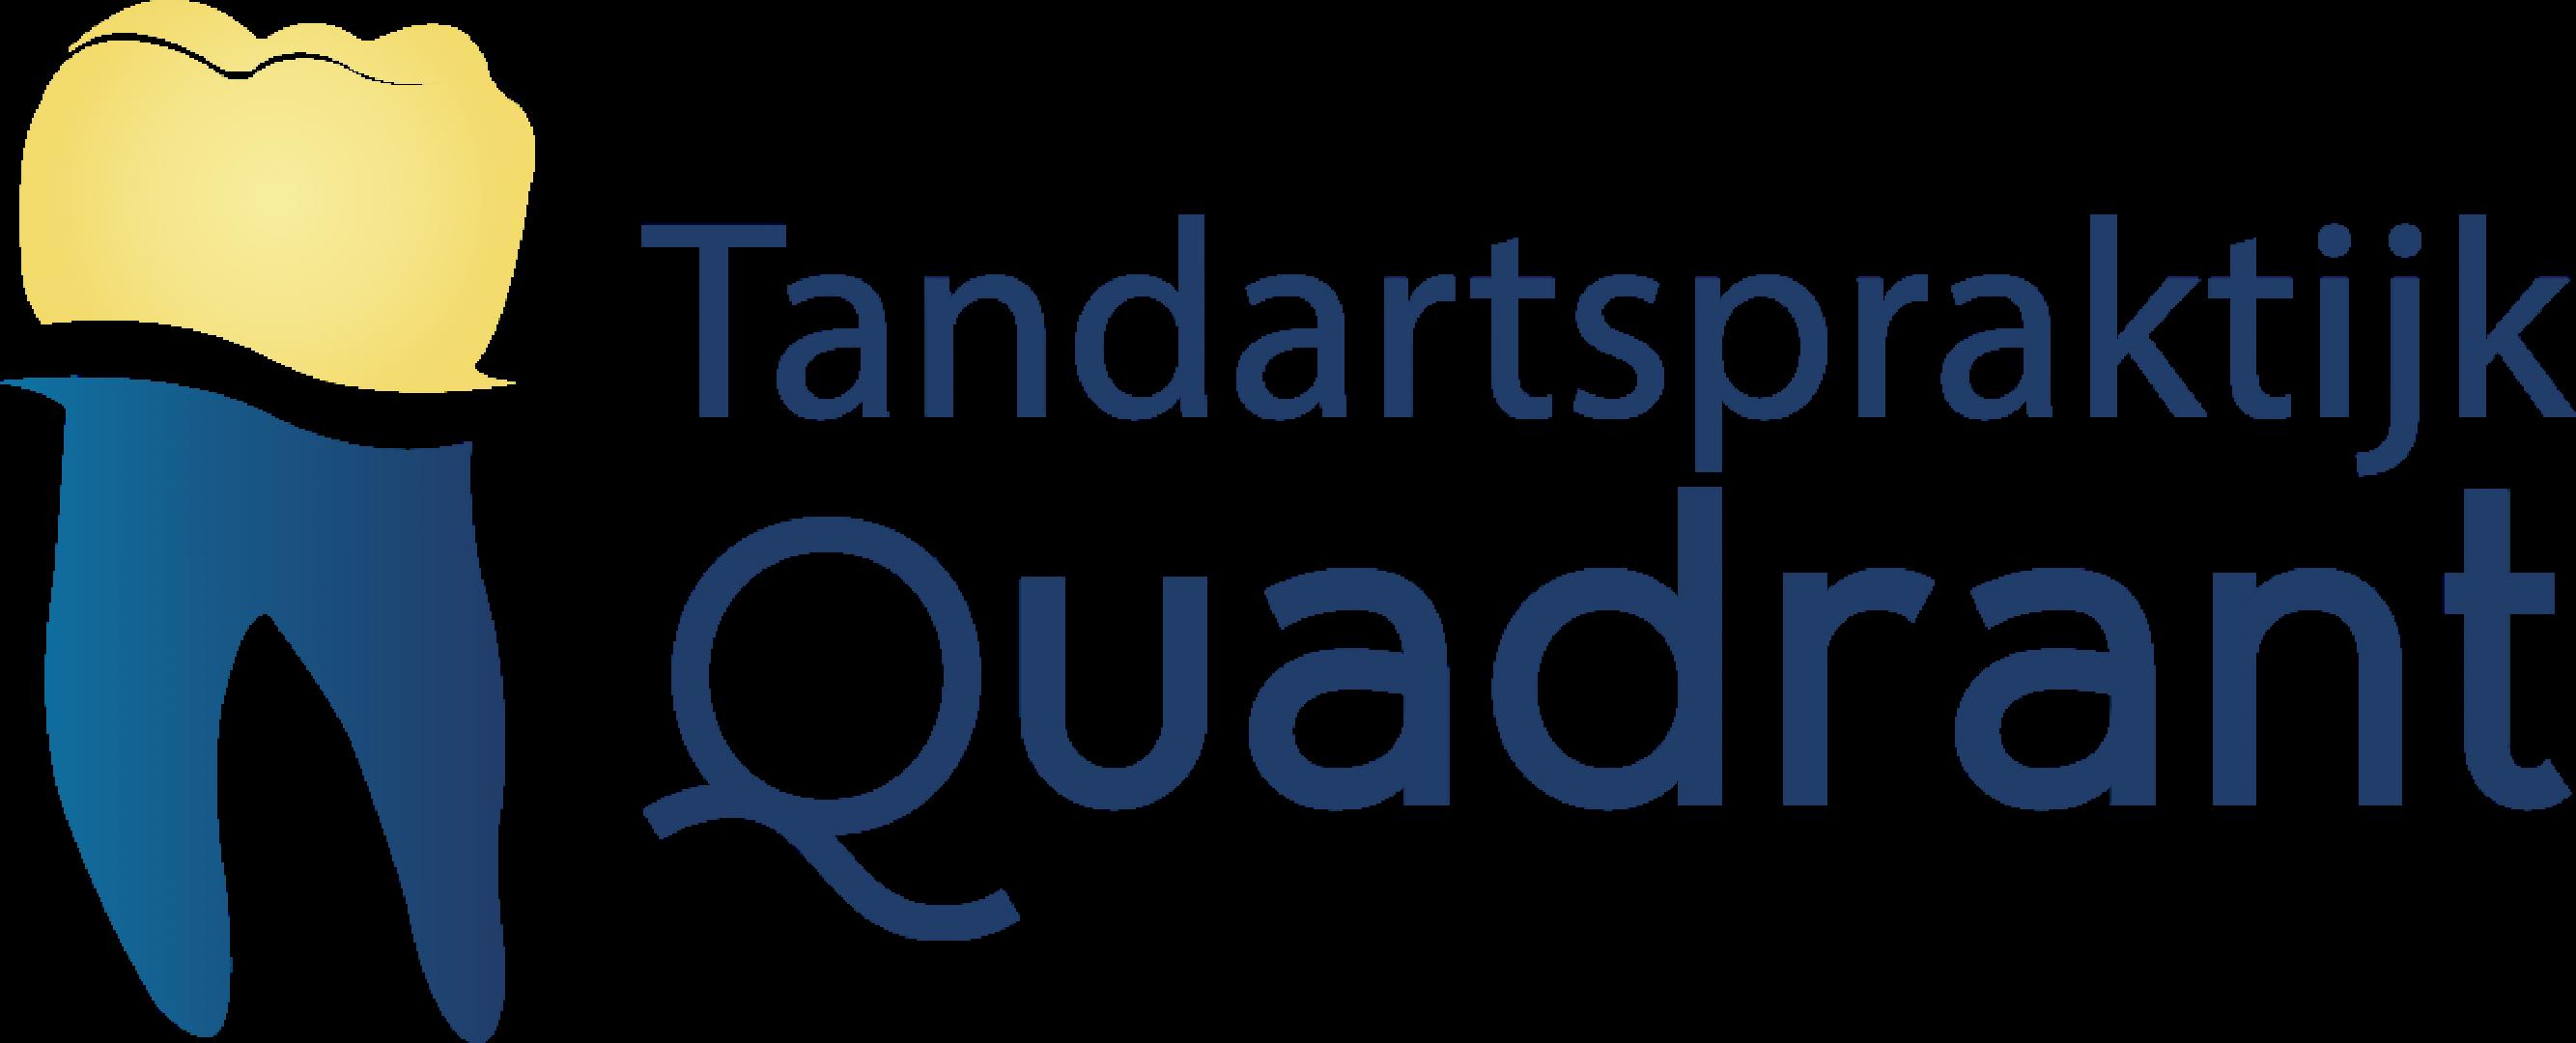 Tandartspraktijk Quadrant